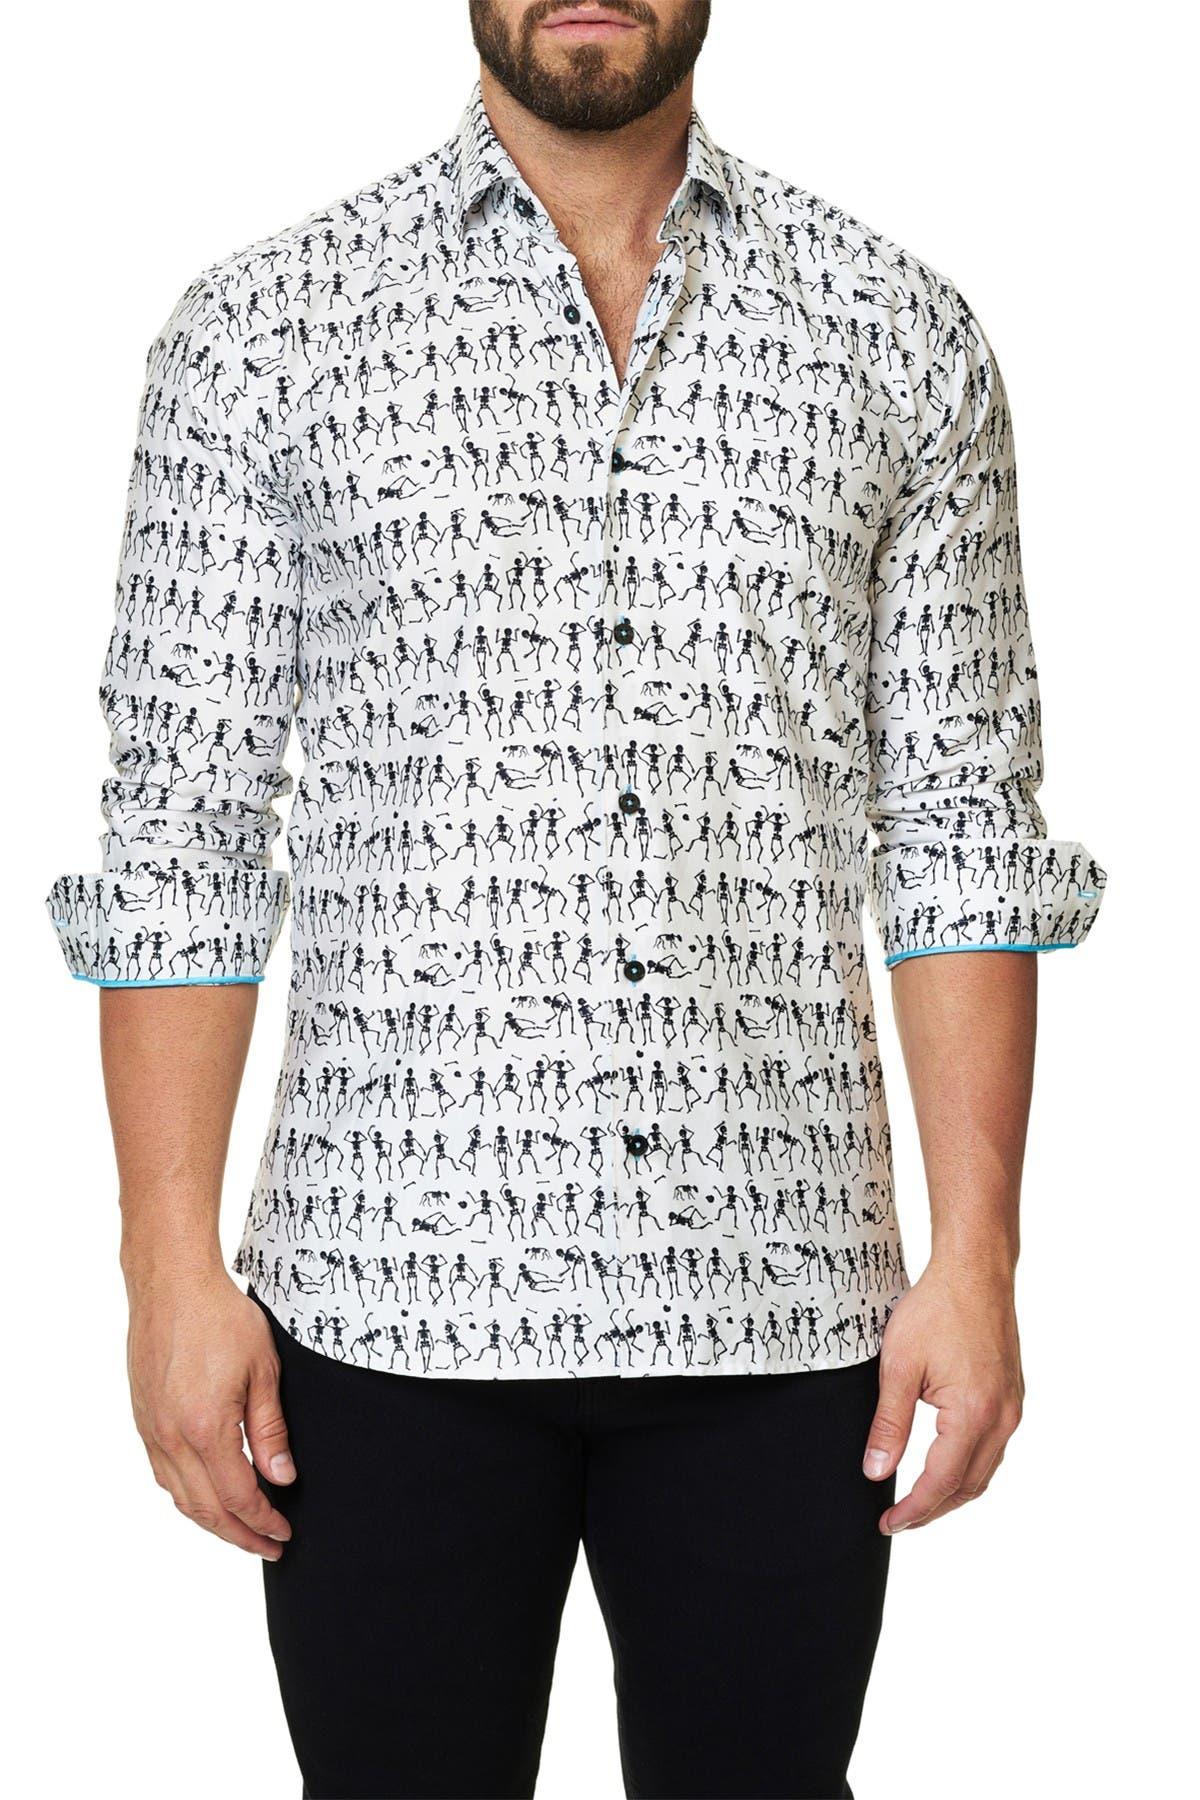 Image of Maceoo Luxor Funky Skeleton Trim Fit Sport Shirt